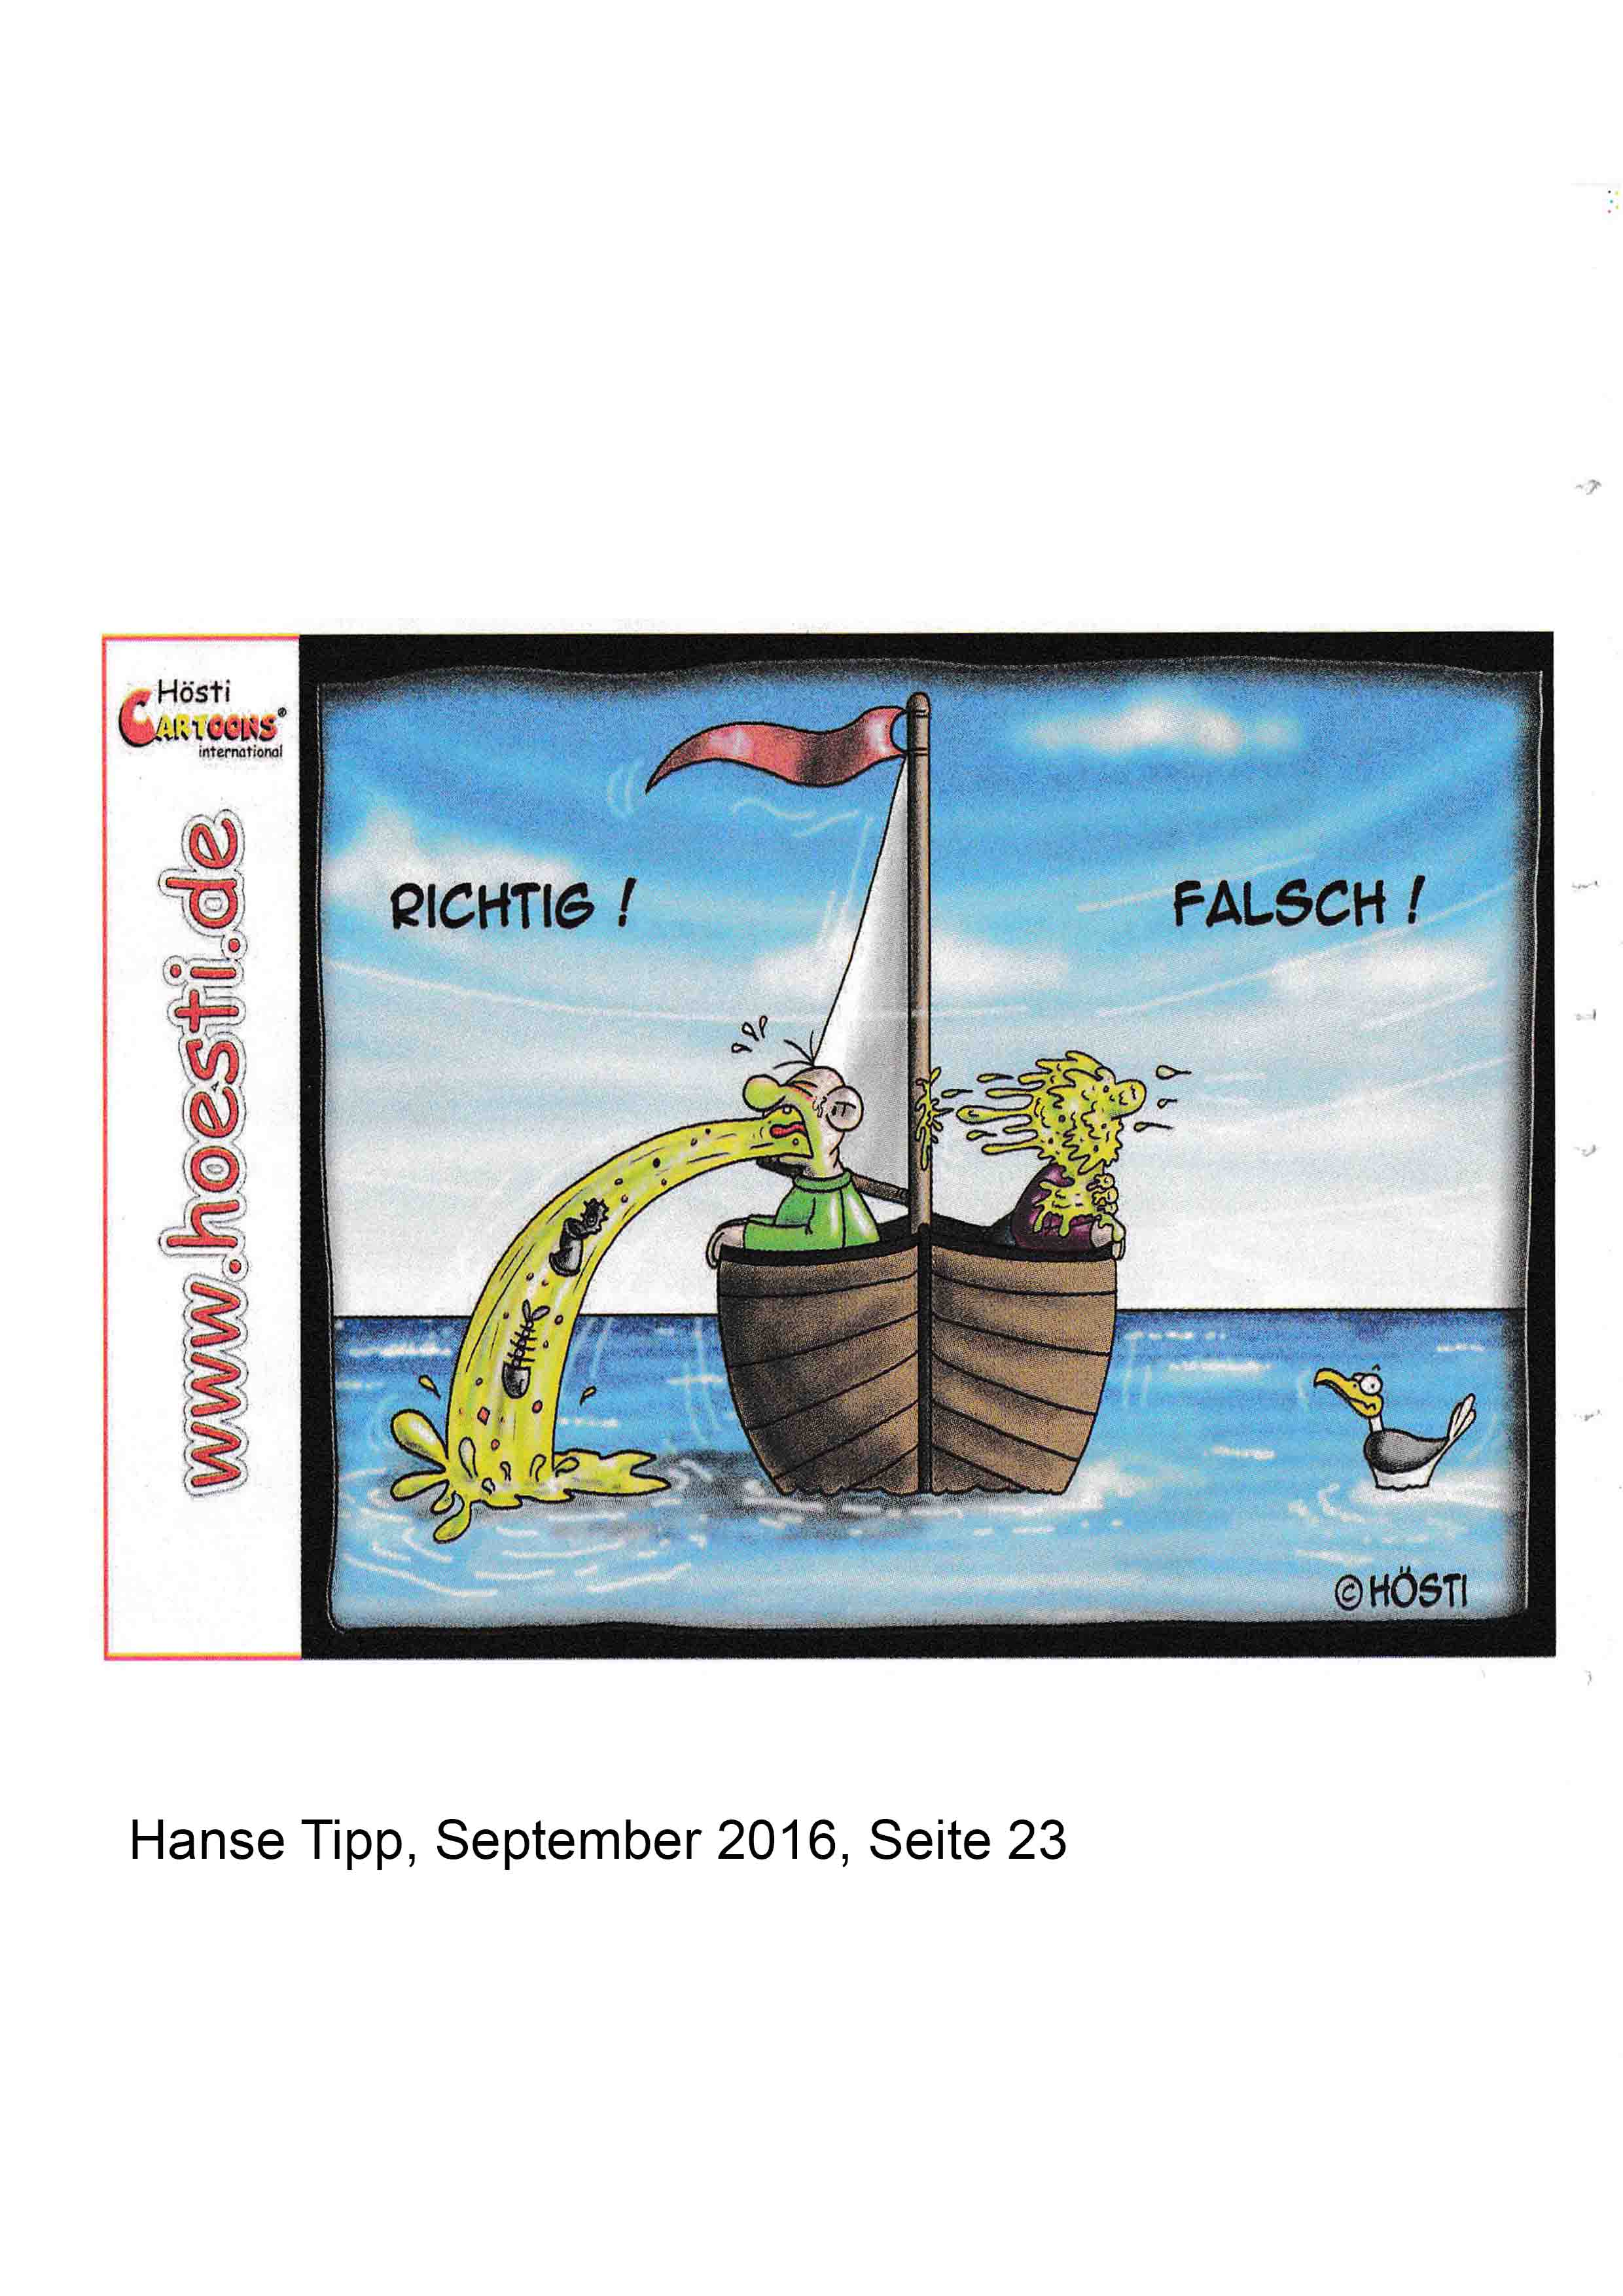 Hanse Tipp September 2016 Seite 23